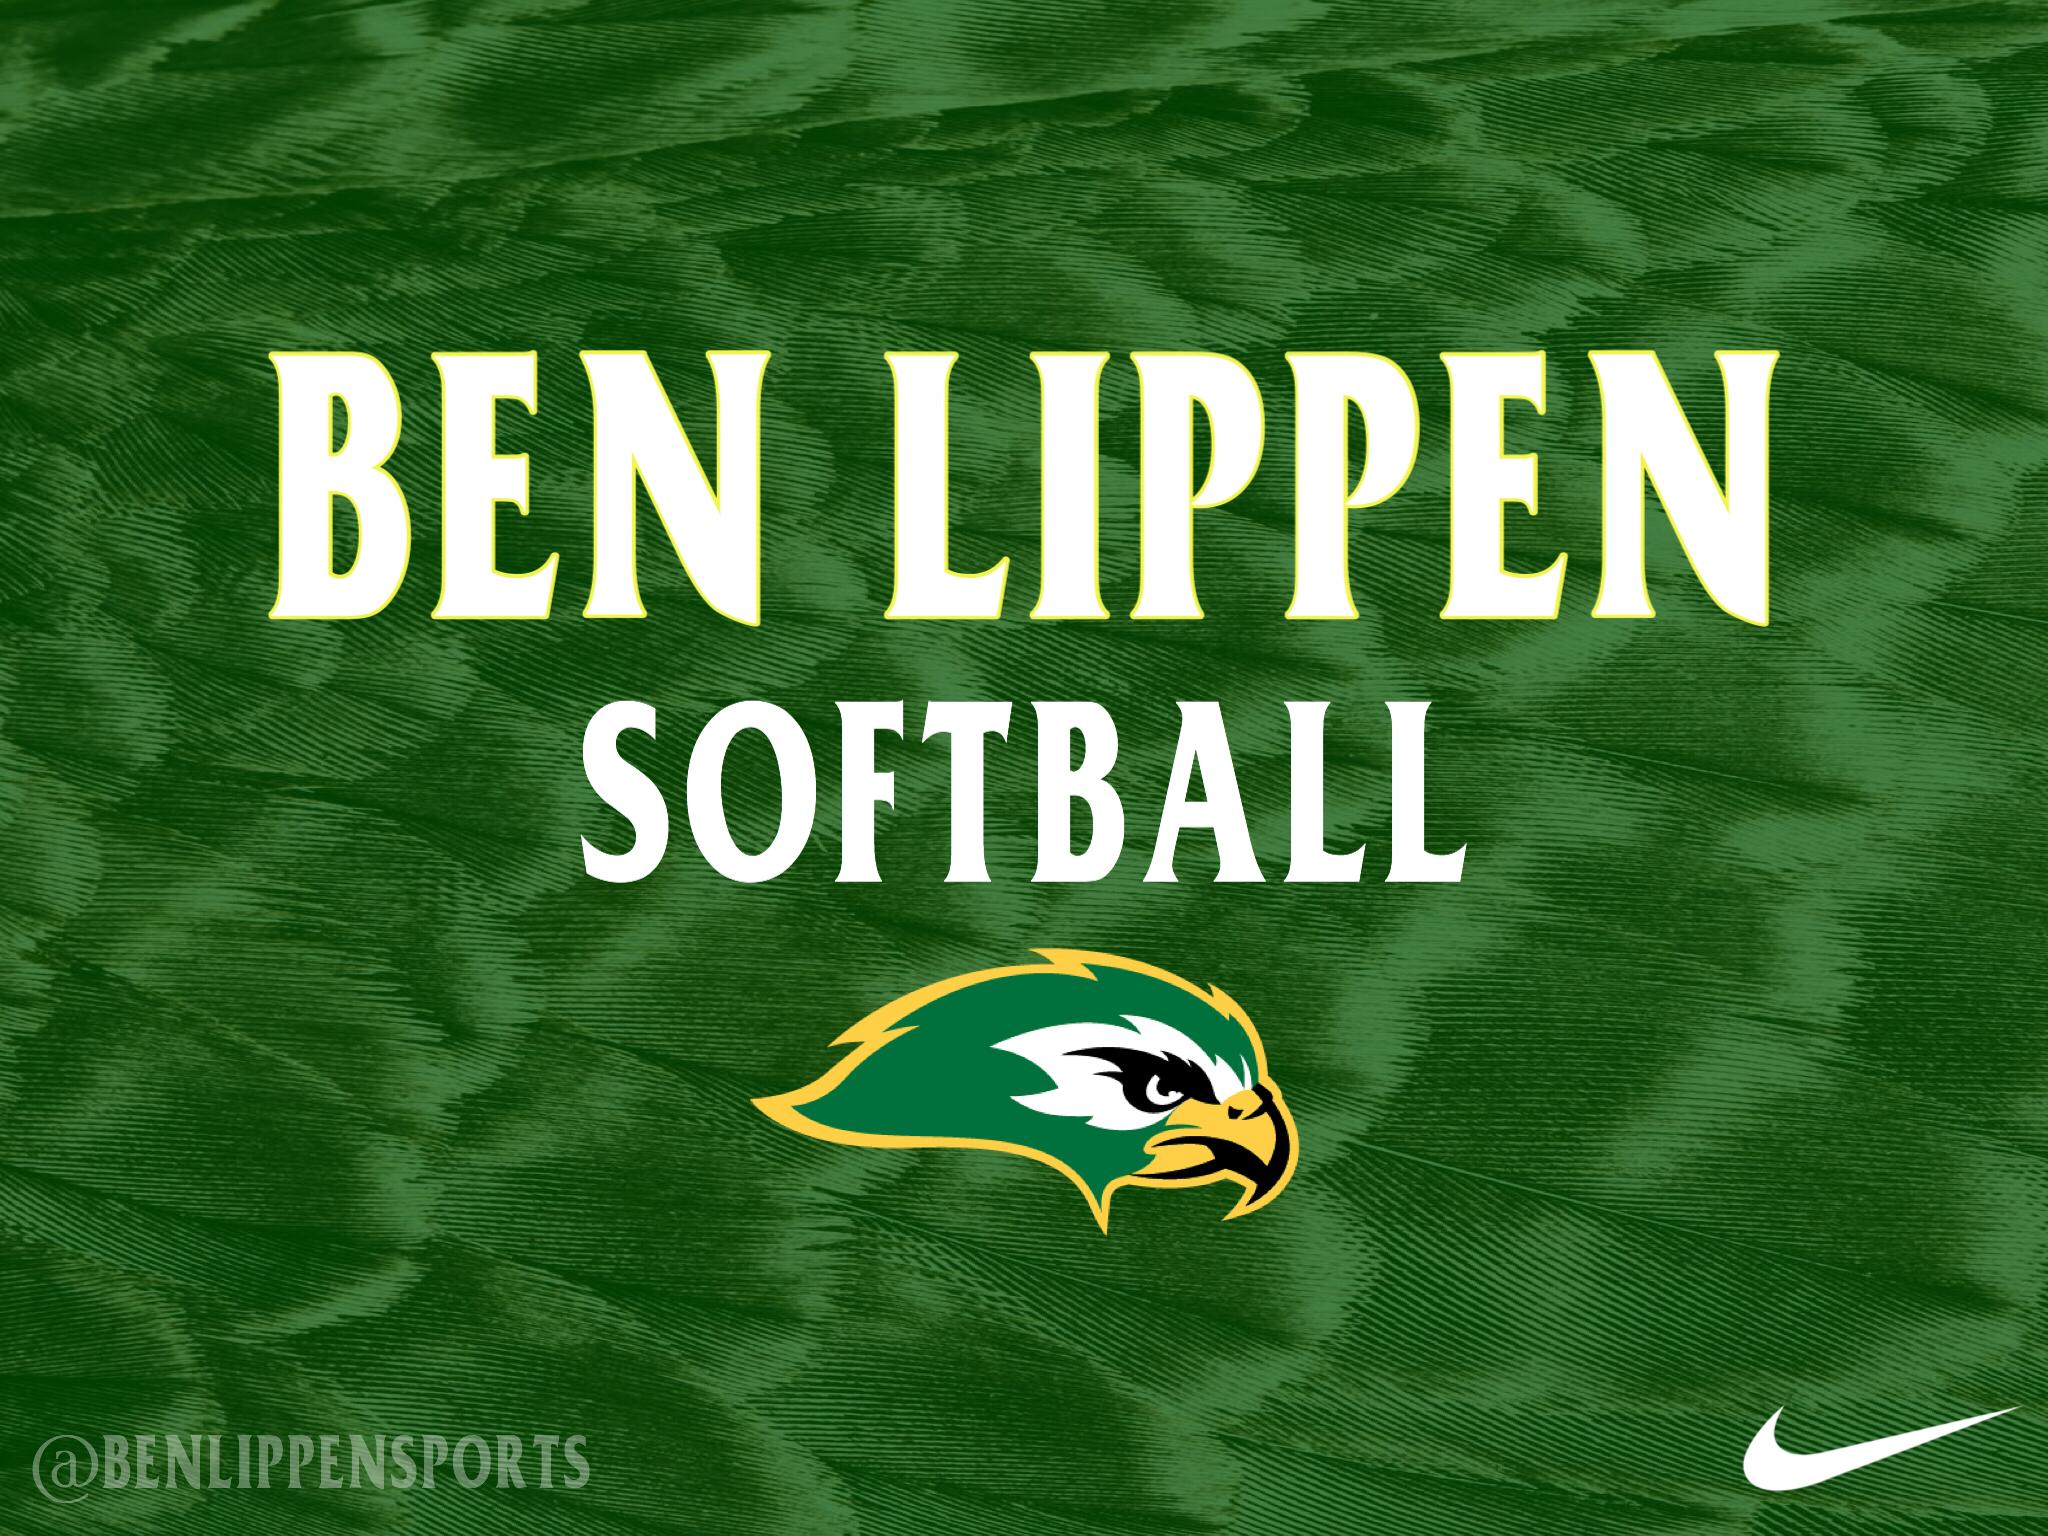 Ben Lippen Softball Team Conditioning Starts Monday, August 20